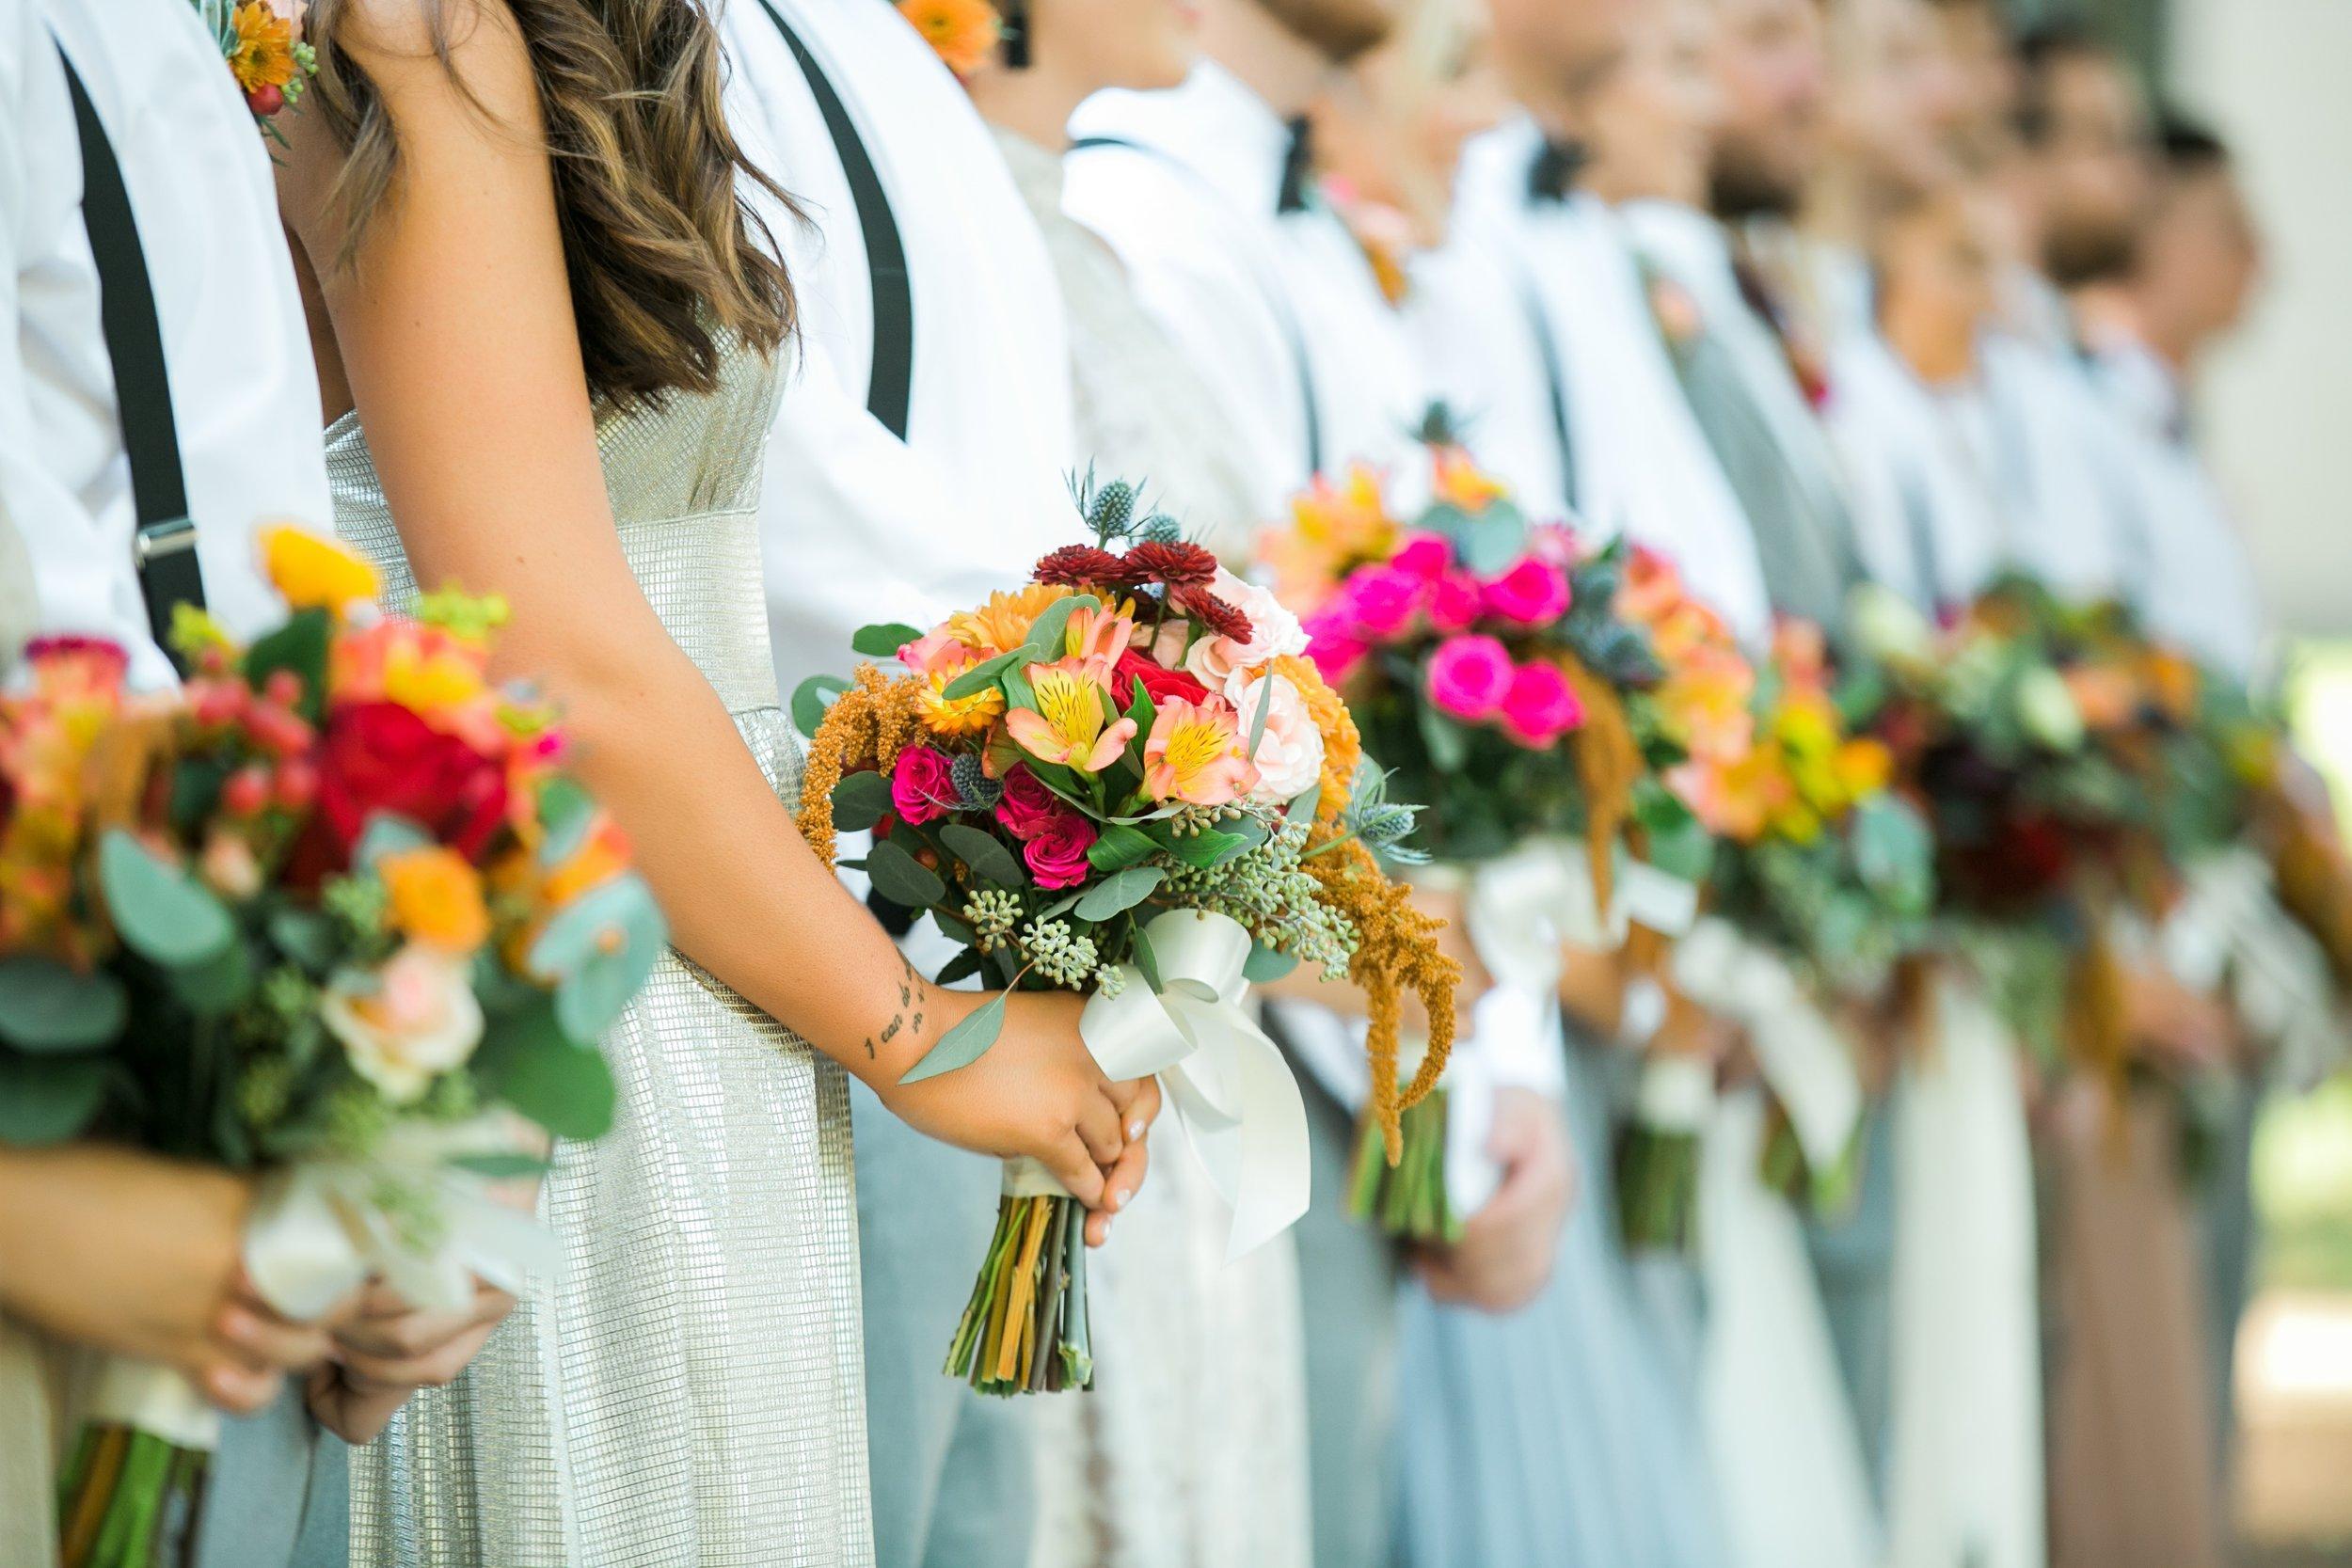 Roberson-Wedding-The-Forum-Lauren-Pinson-Wedding-Photography-Wichita-Falls-Texas-059.jpg